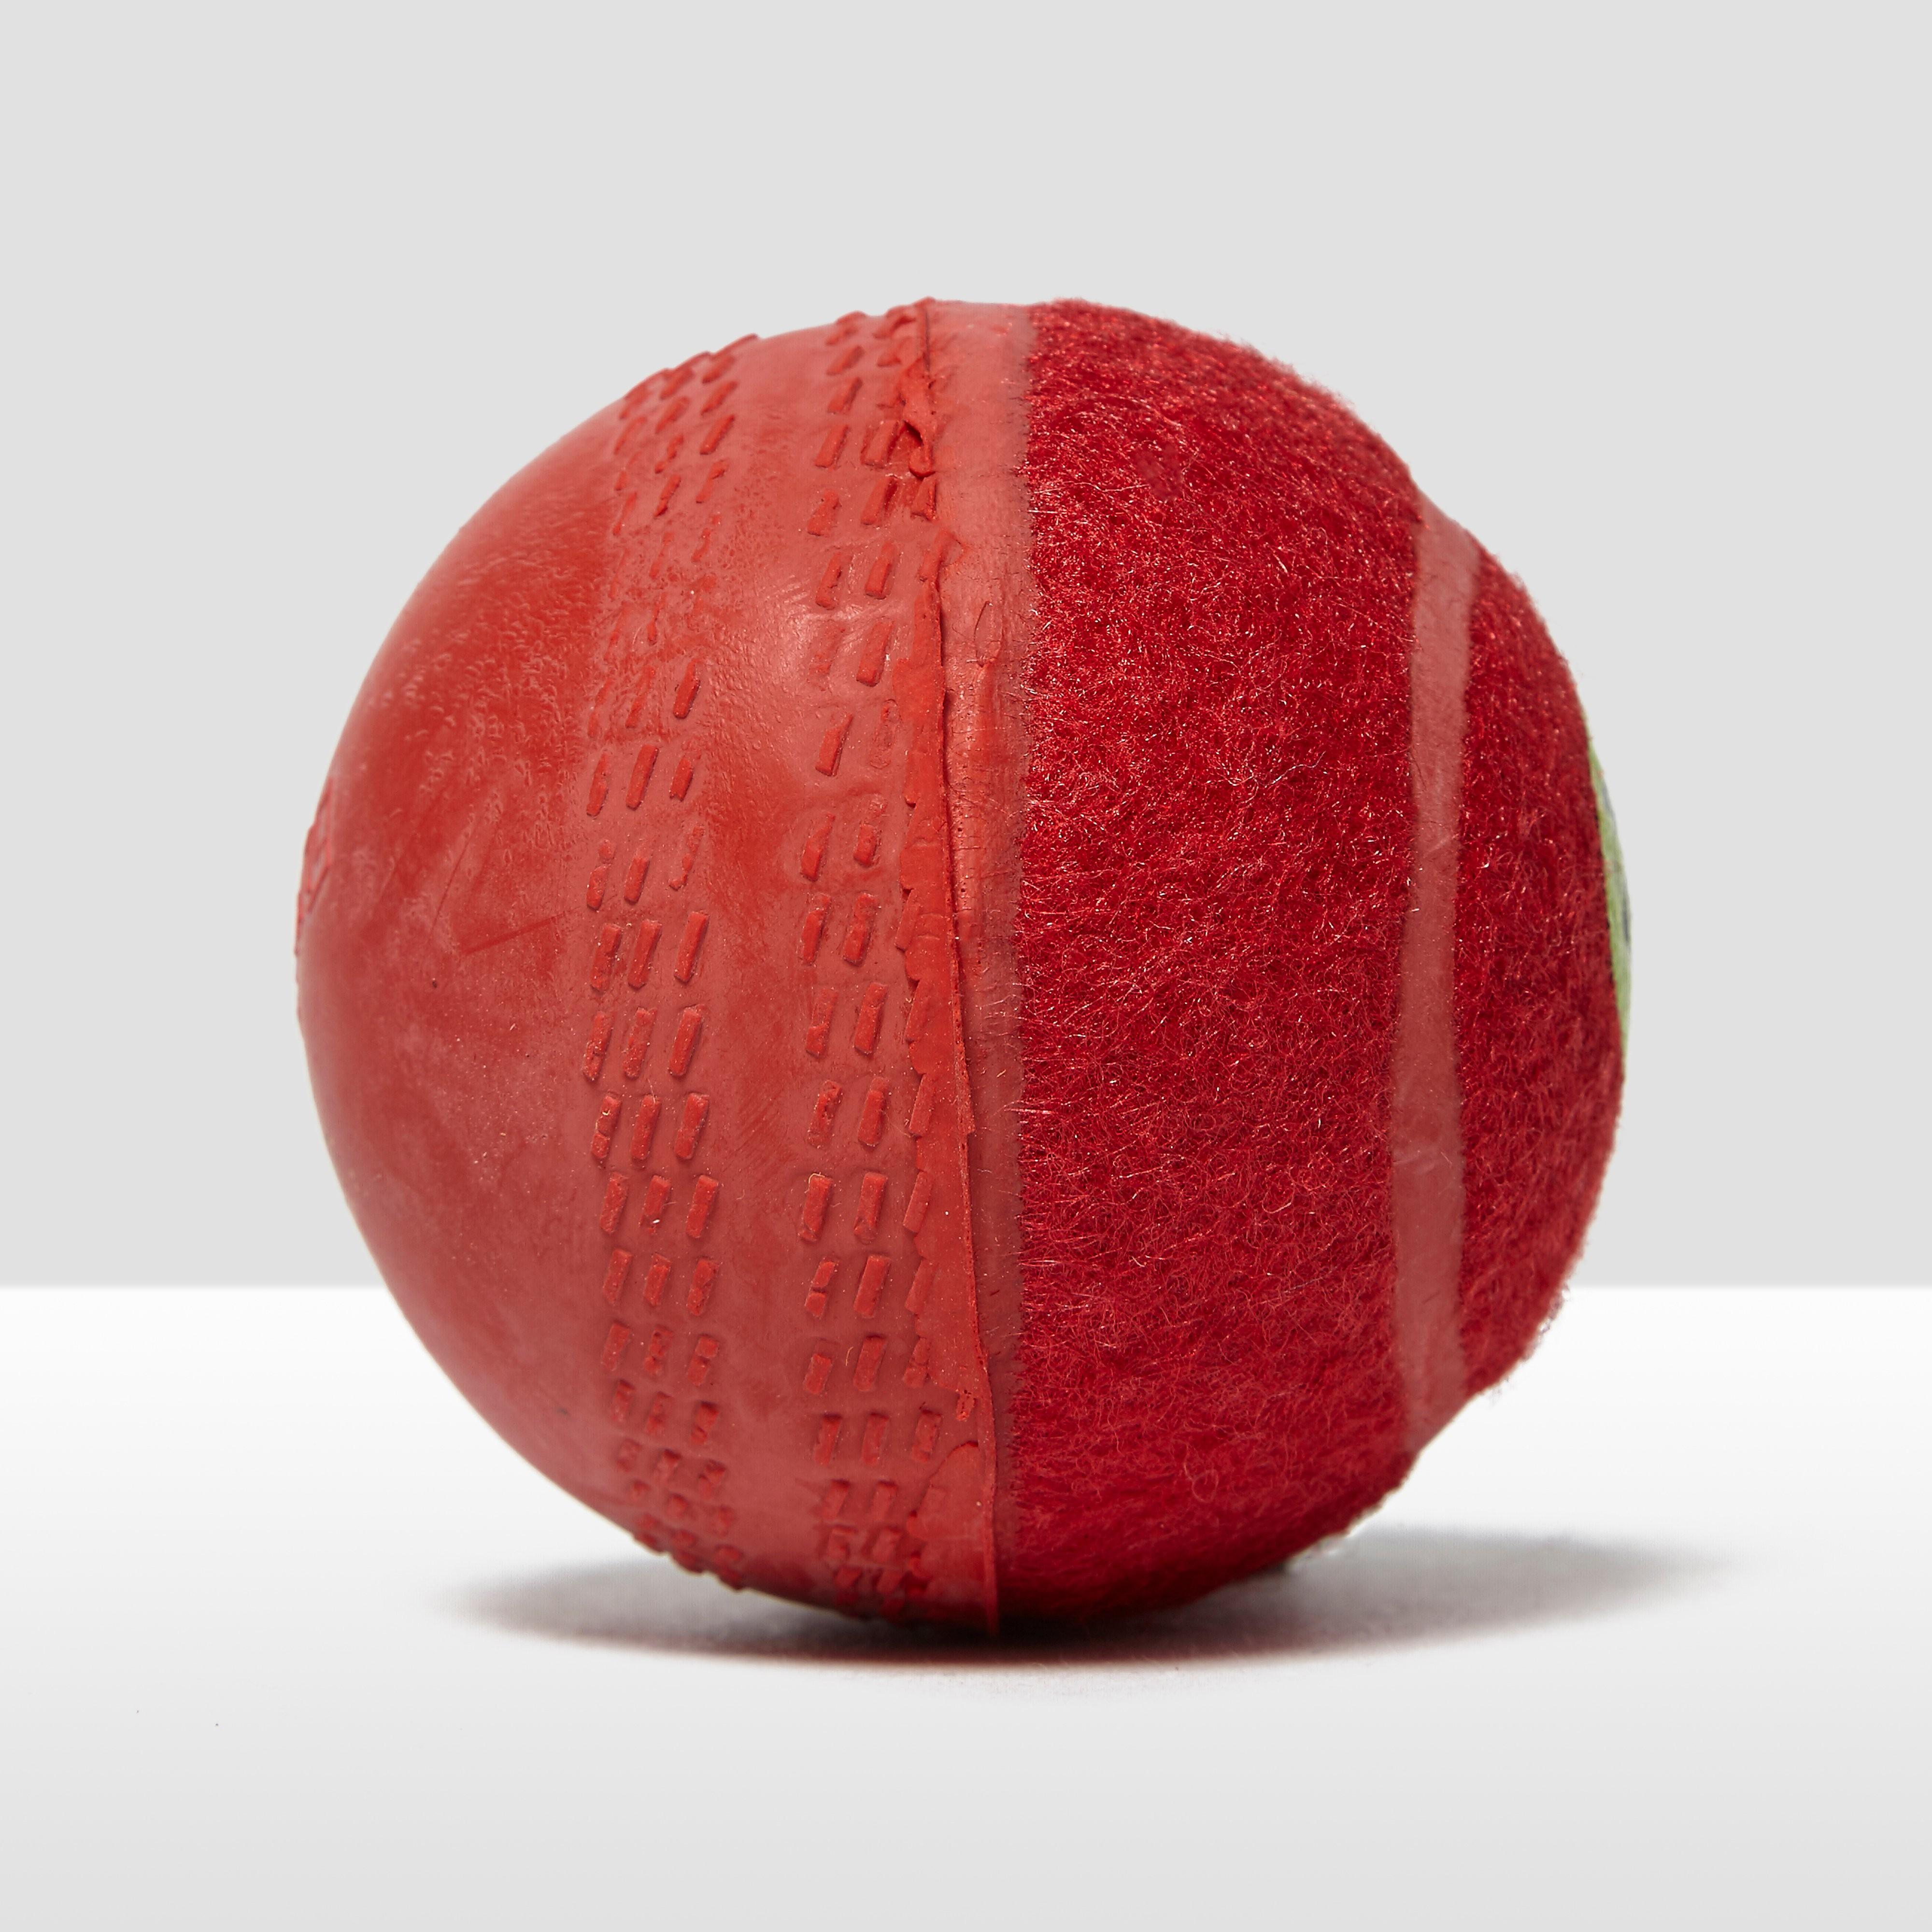 Gunn & Moore Swingking Cricket Ball